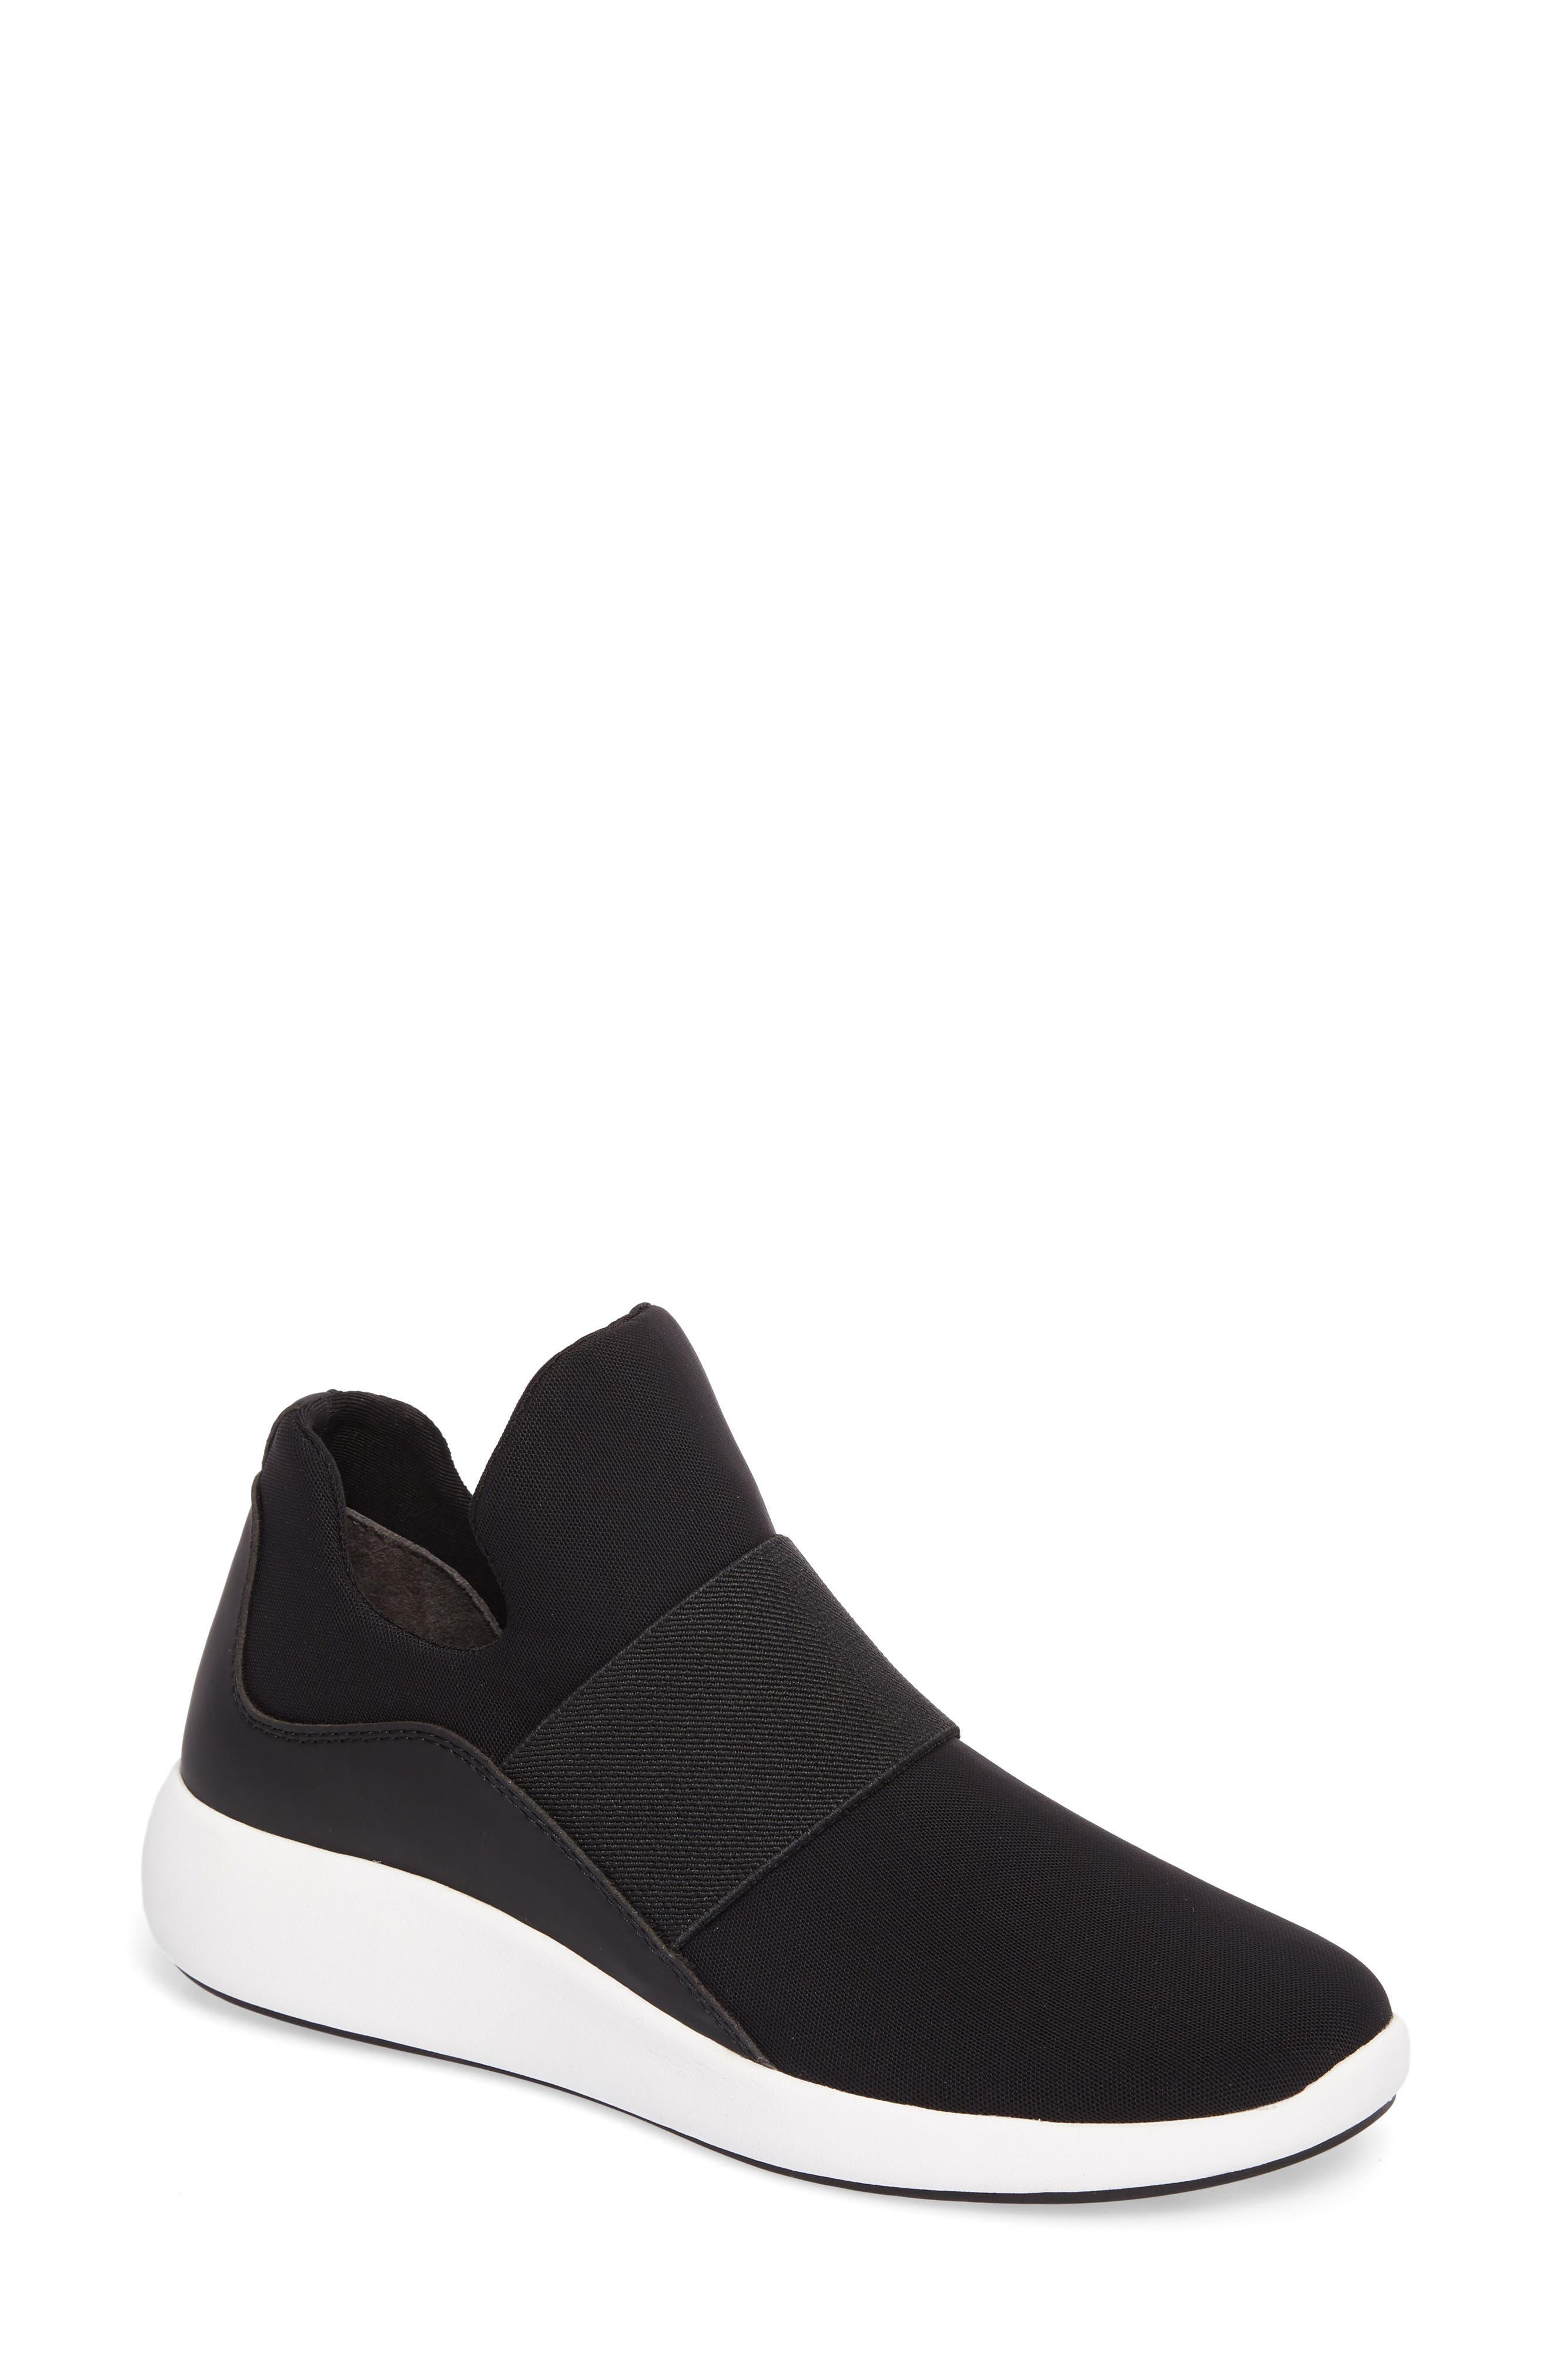 Donna Karan Cory Slip-On Sneaker (Women)